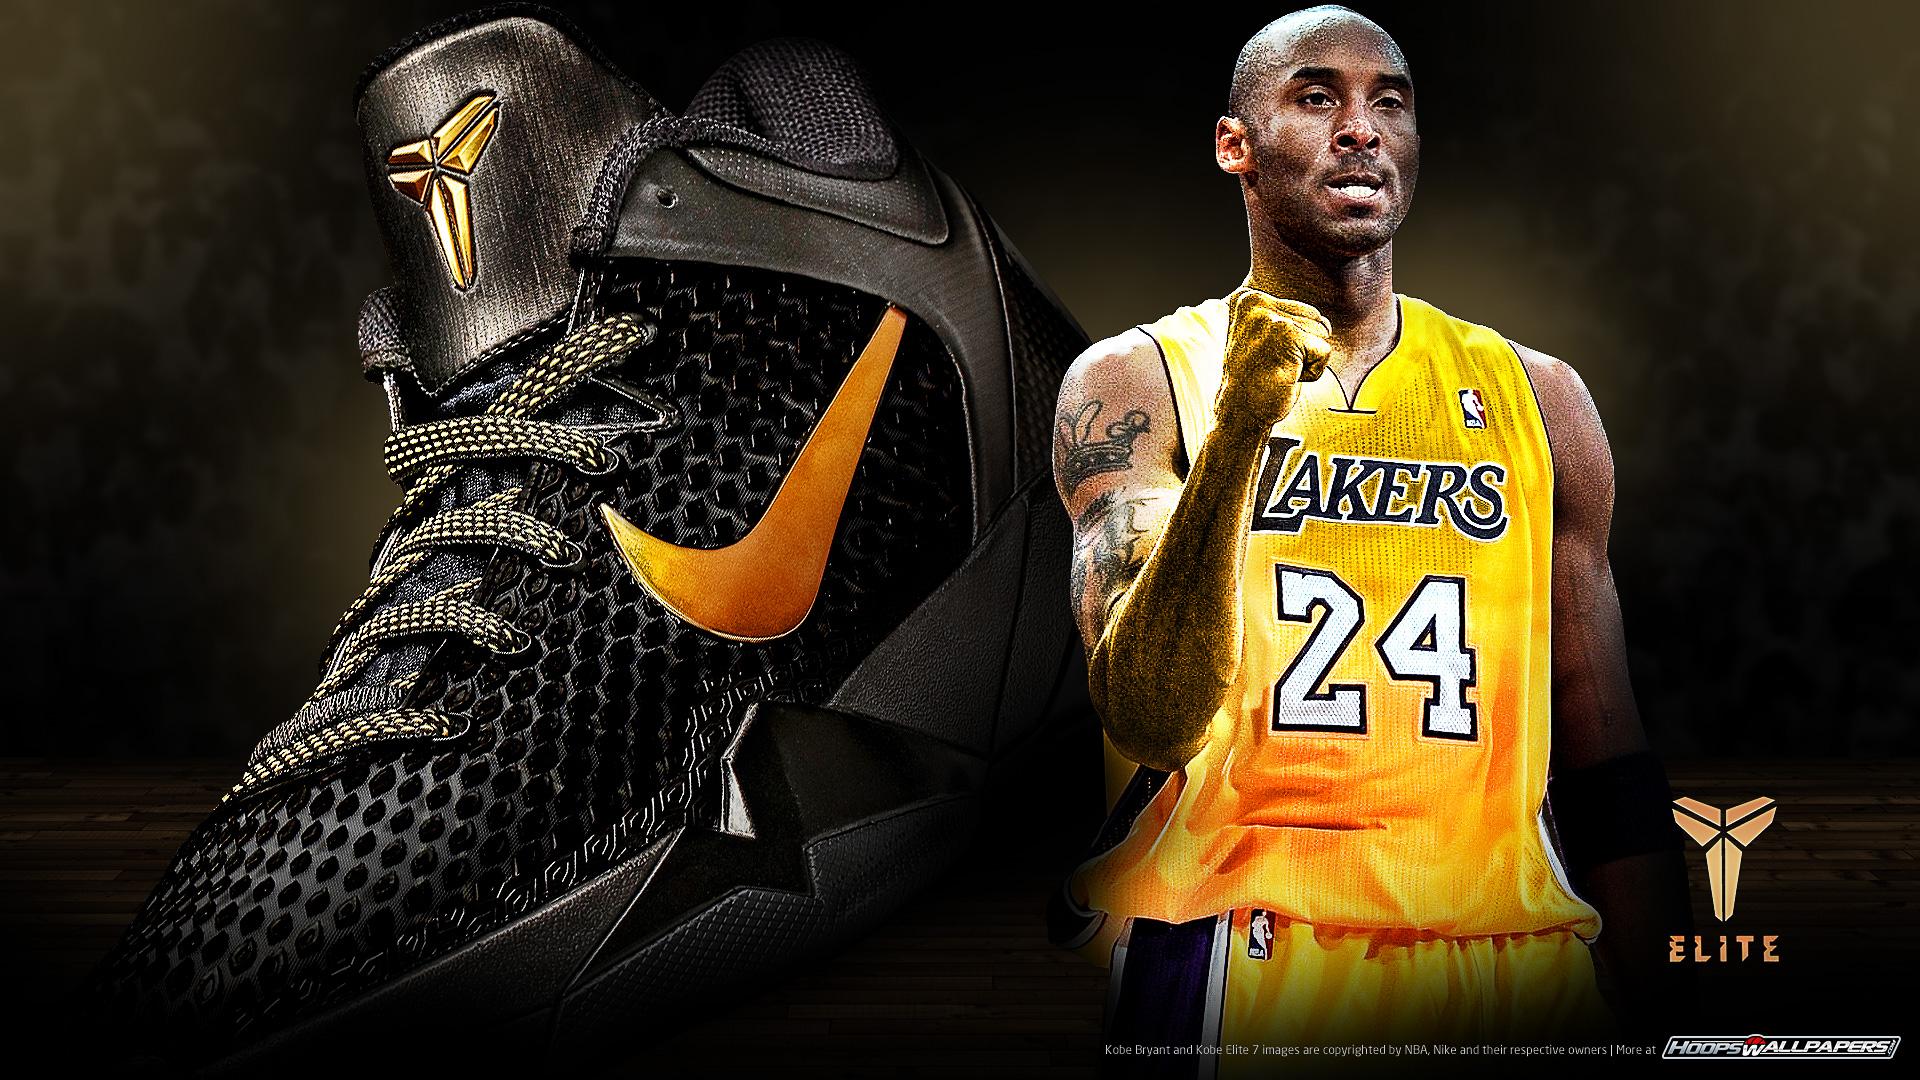 Blog Archive 2012 Playoffs Kobe Bryant Elite wallpaper 1920x1080